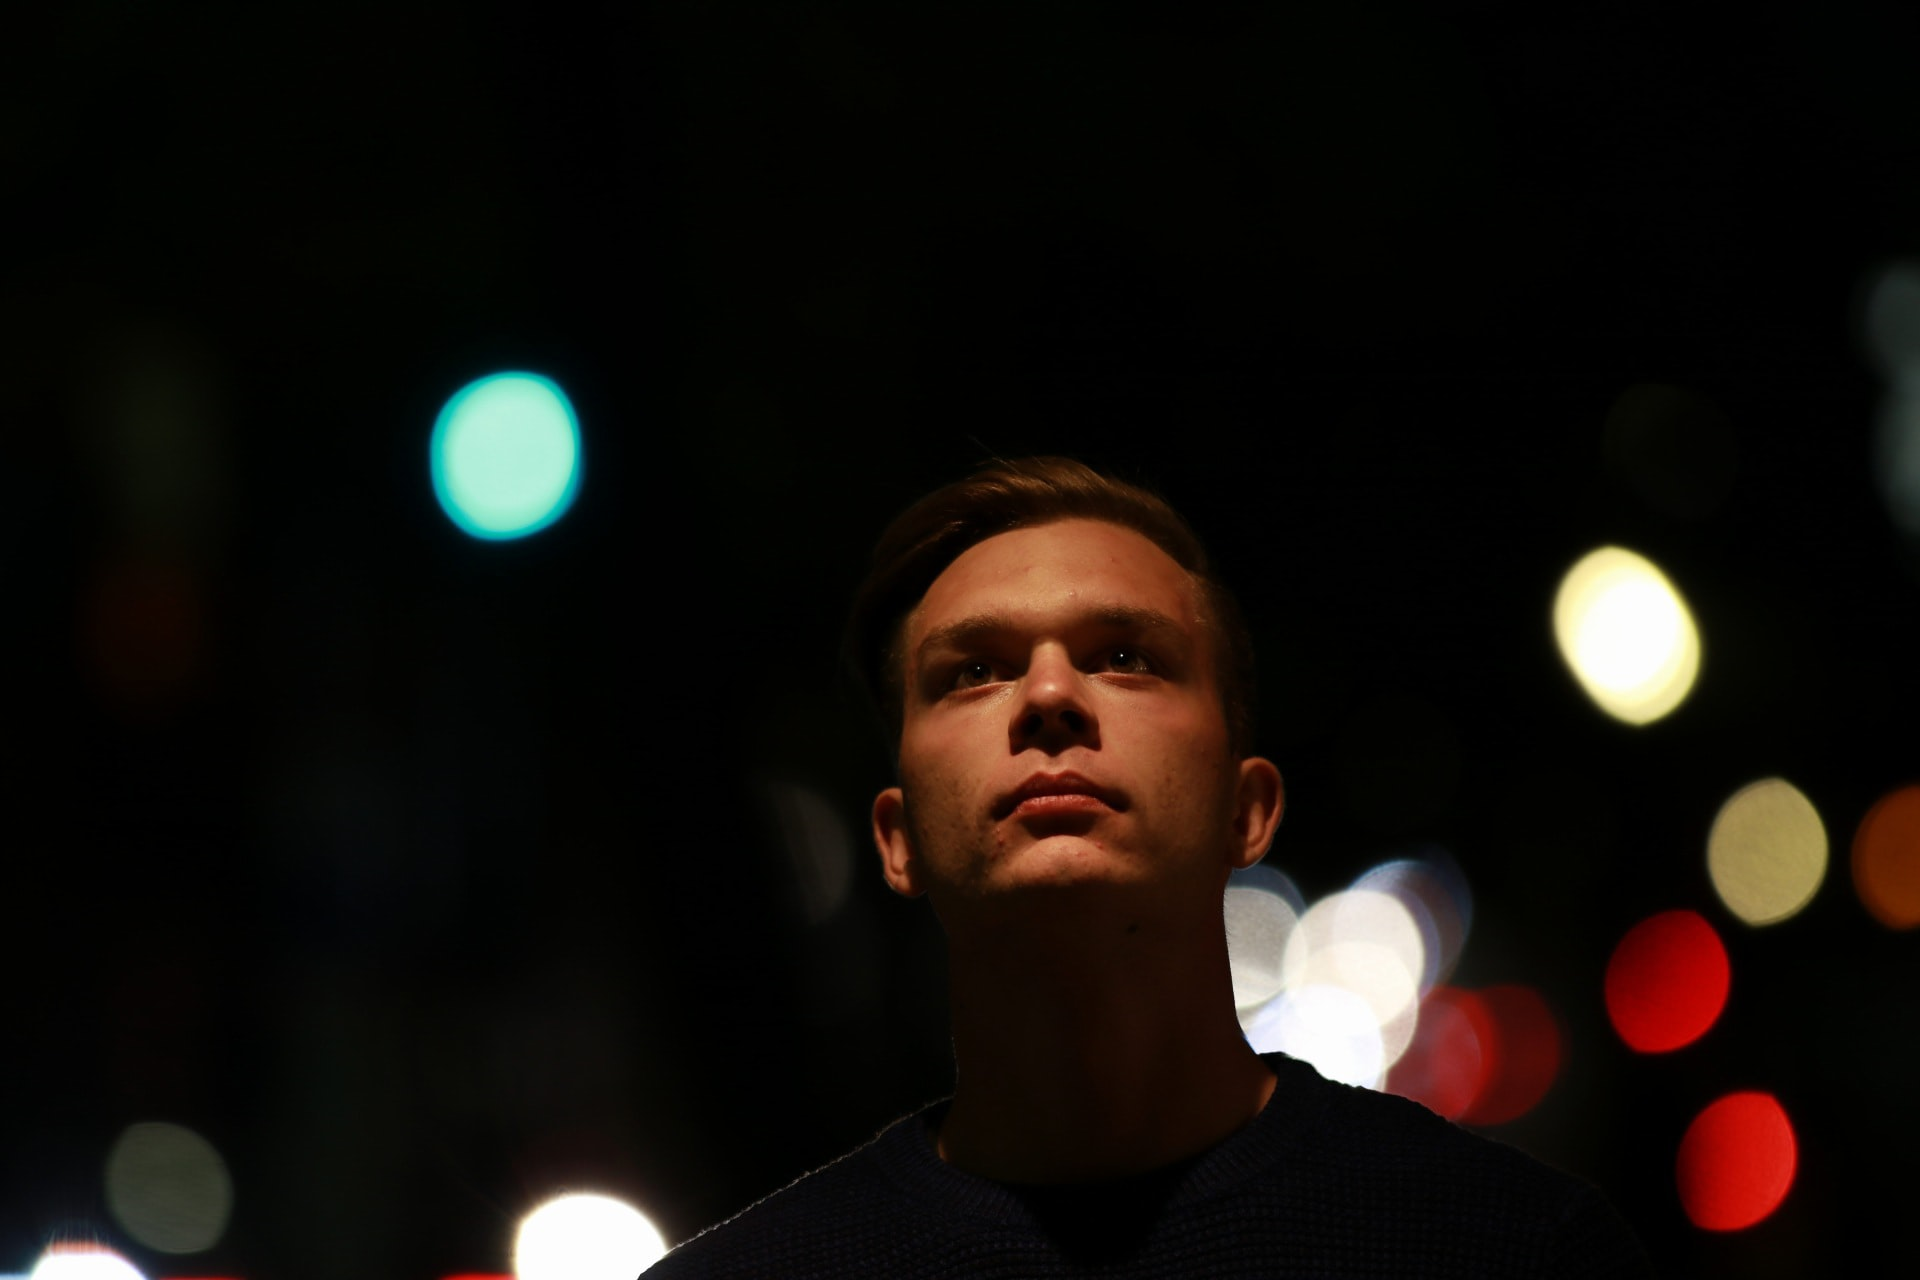 Go to Ivan Bogdanov's profile